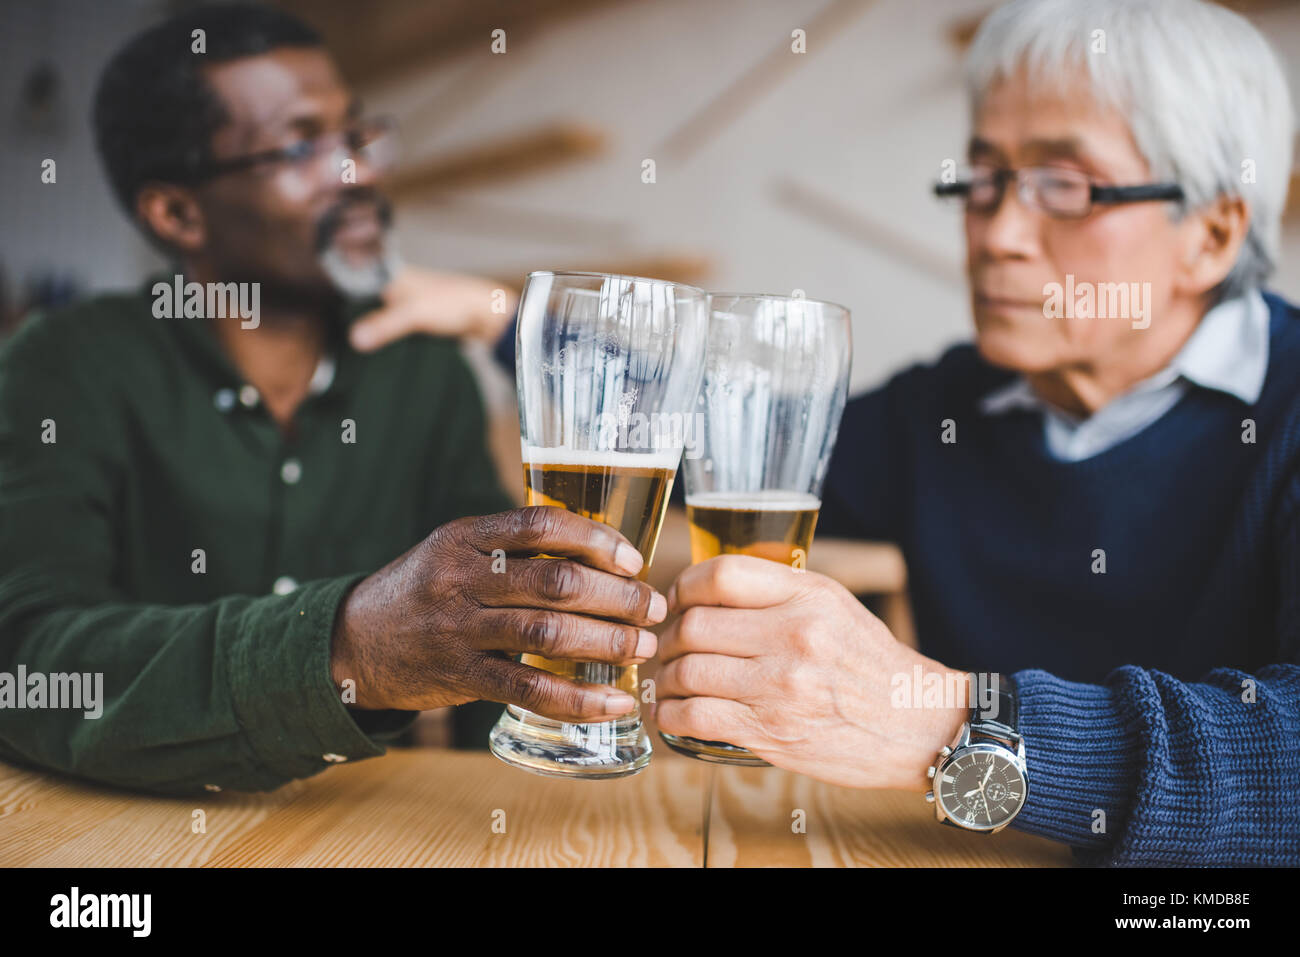 senior friends clinking glasses - Stock Image